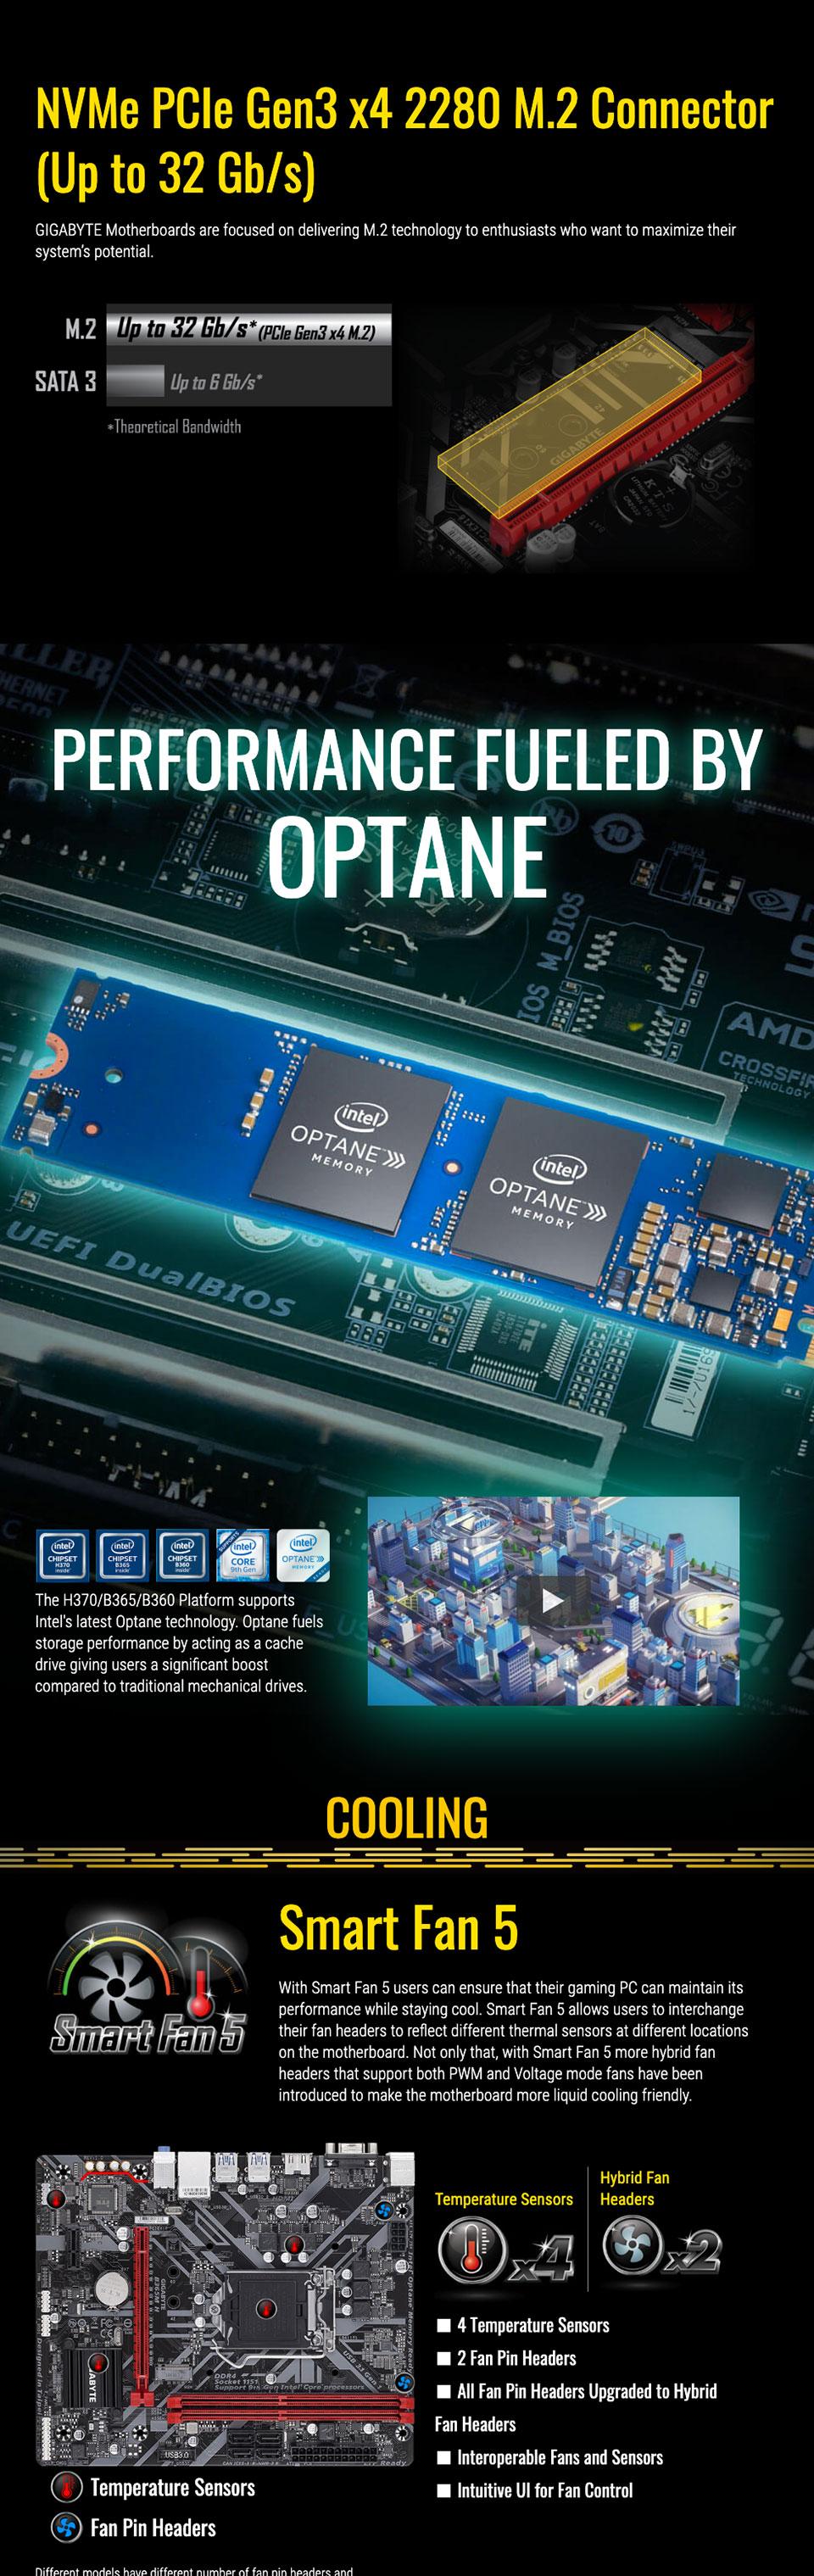 Gigabyte B365M-H Motherboard